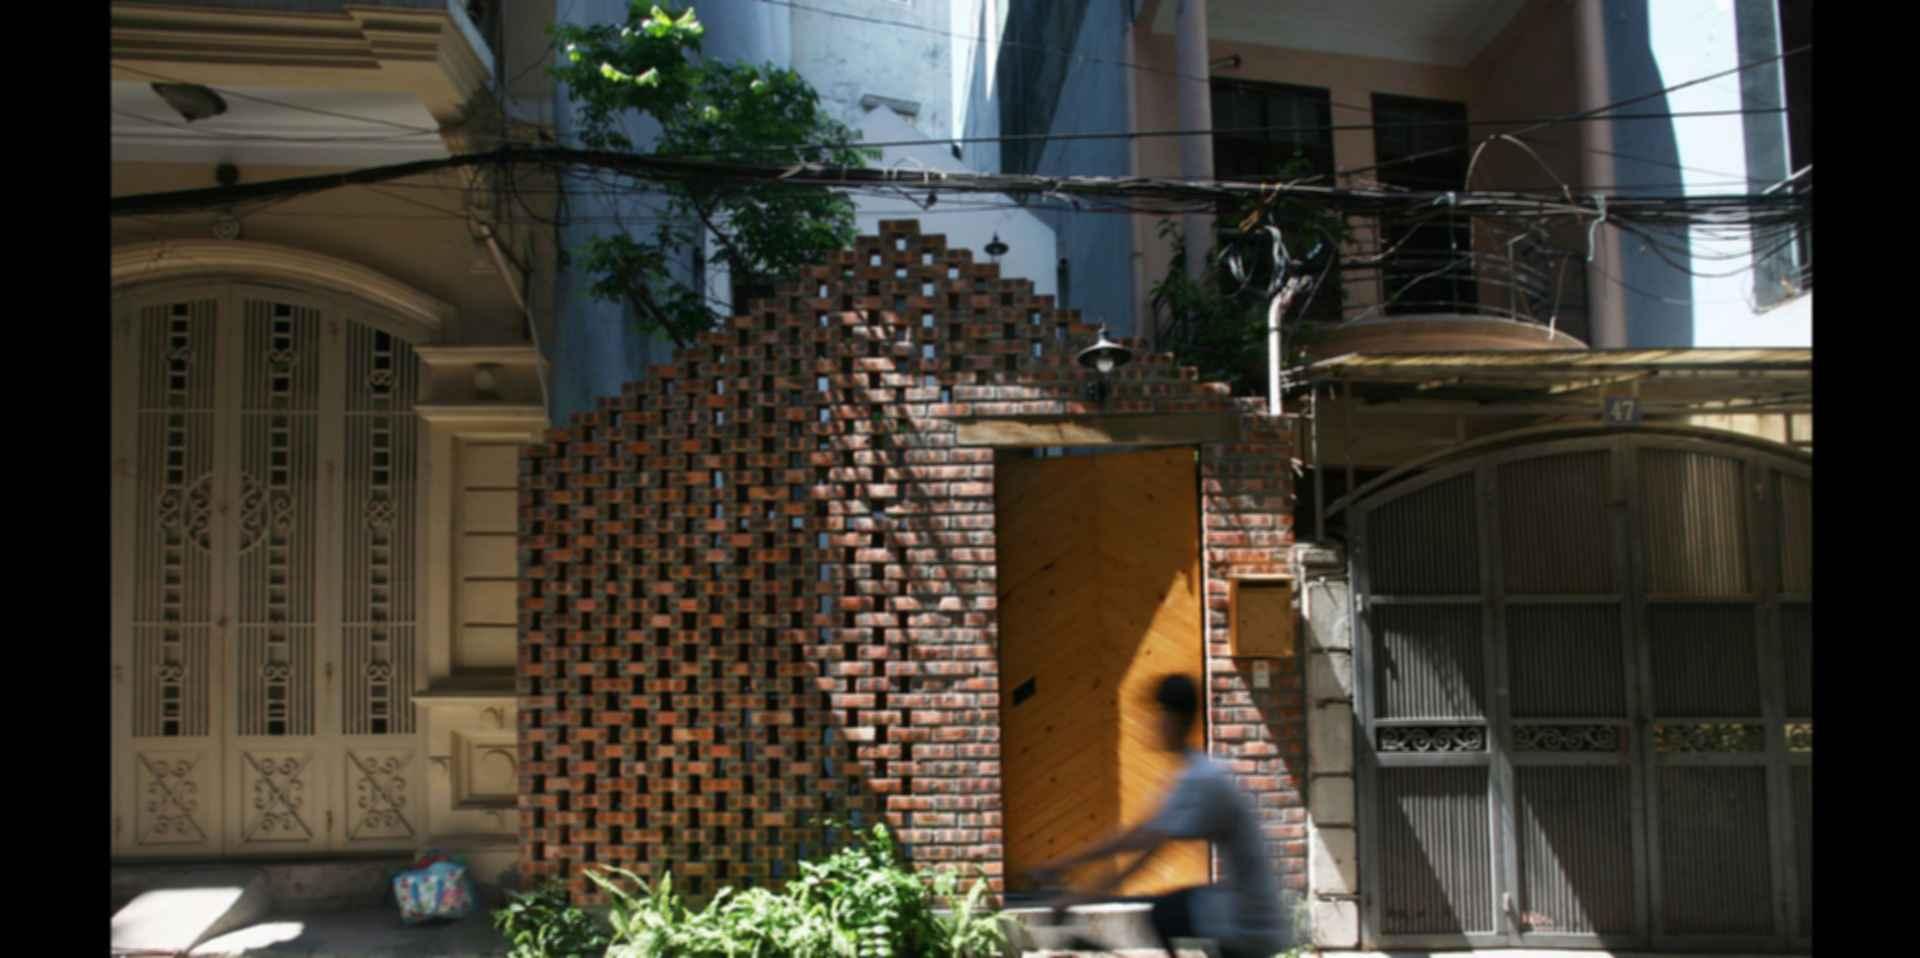 Maison T House - Exterior/Street View